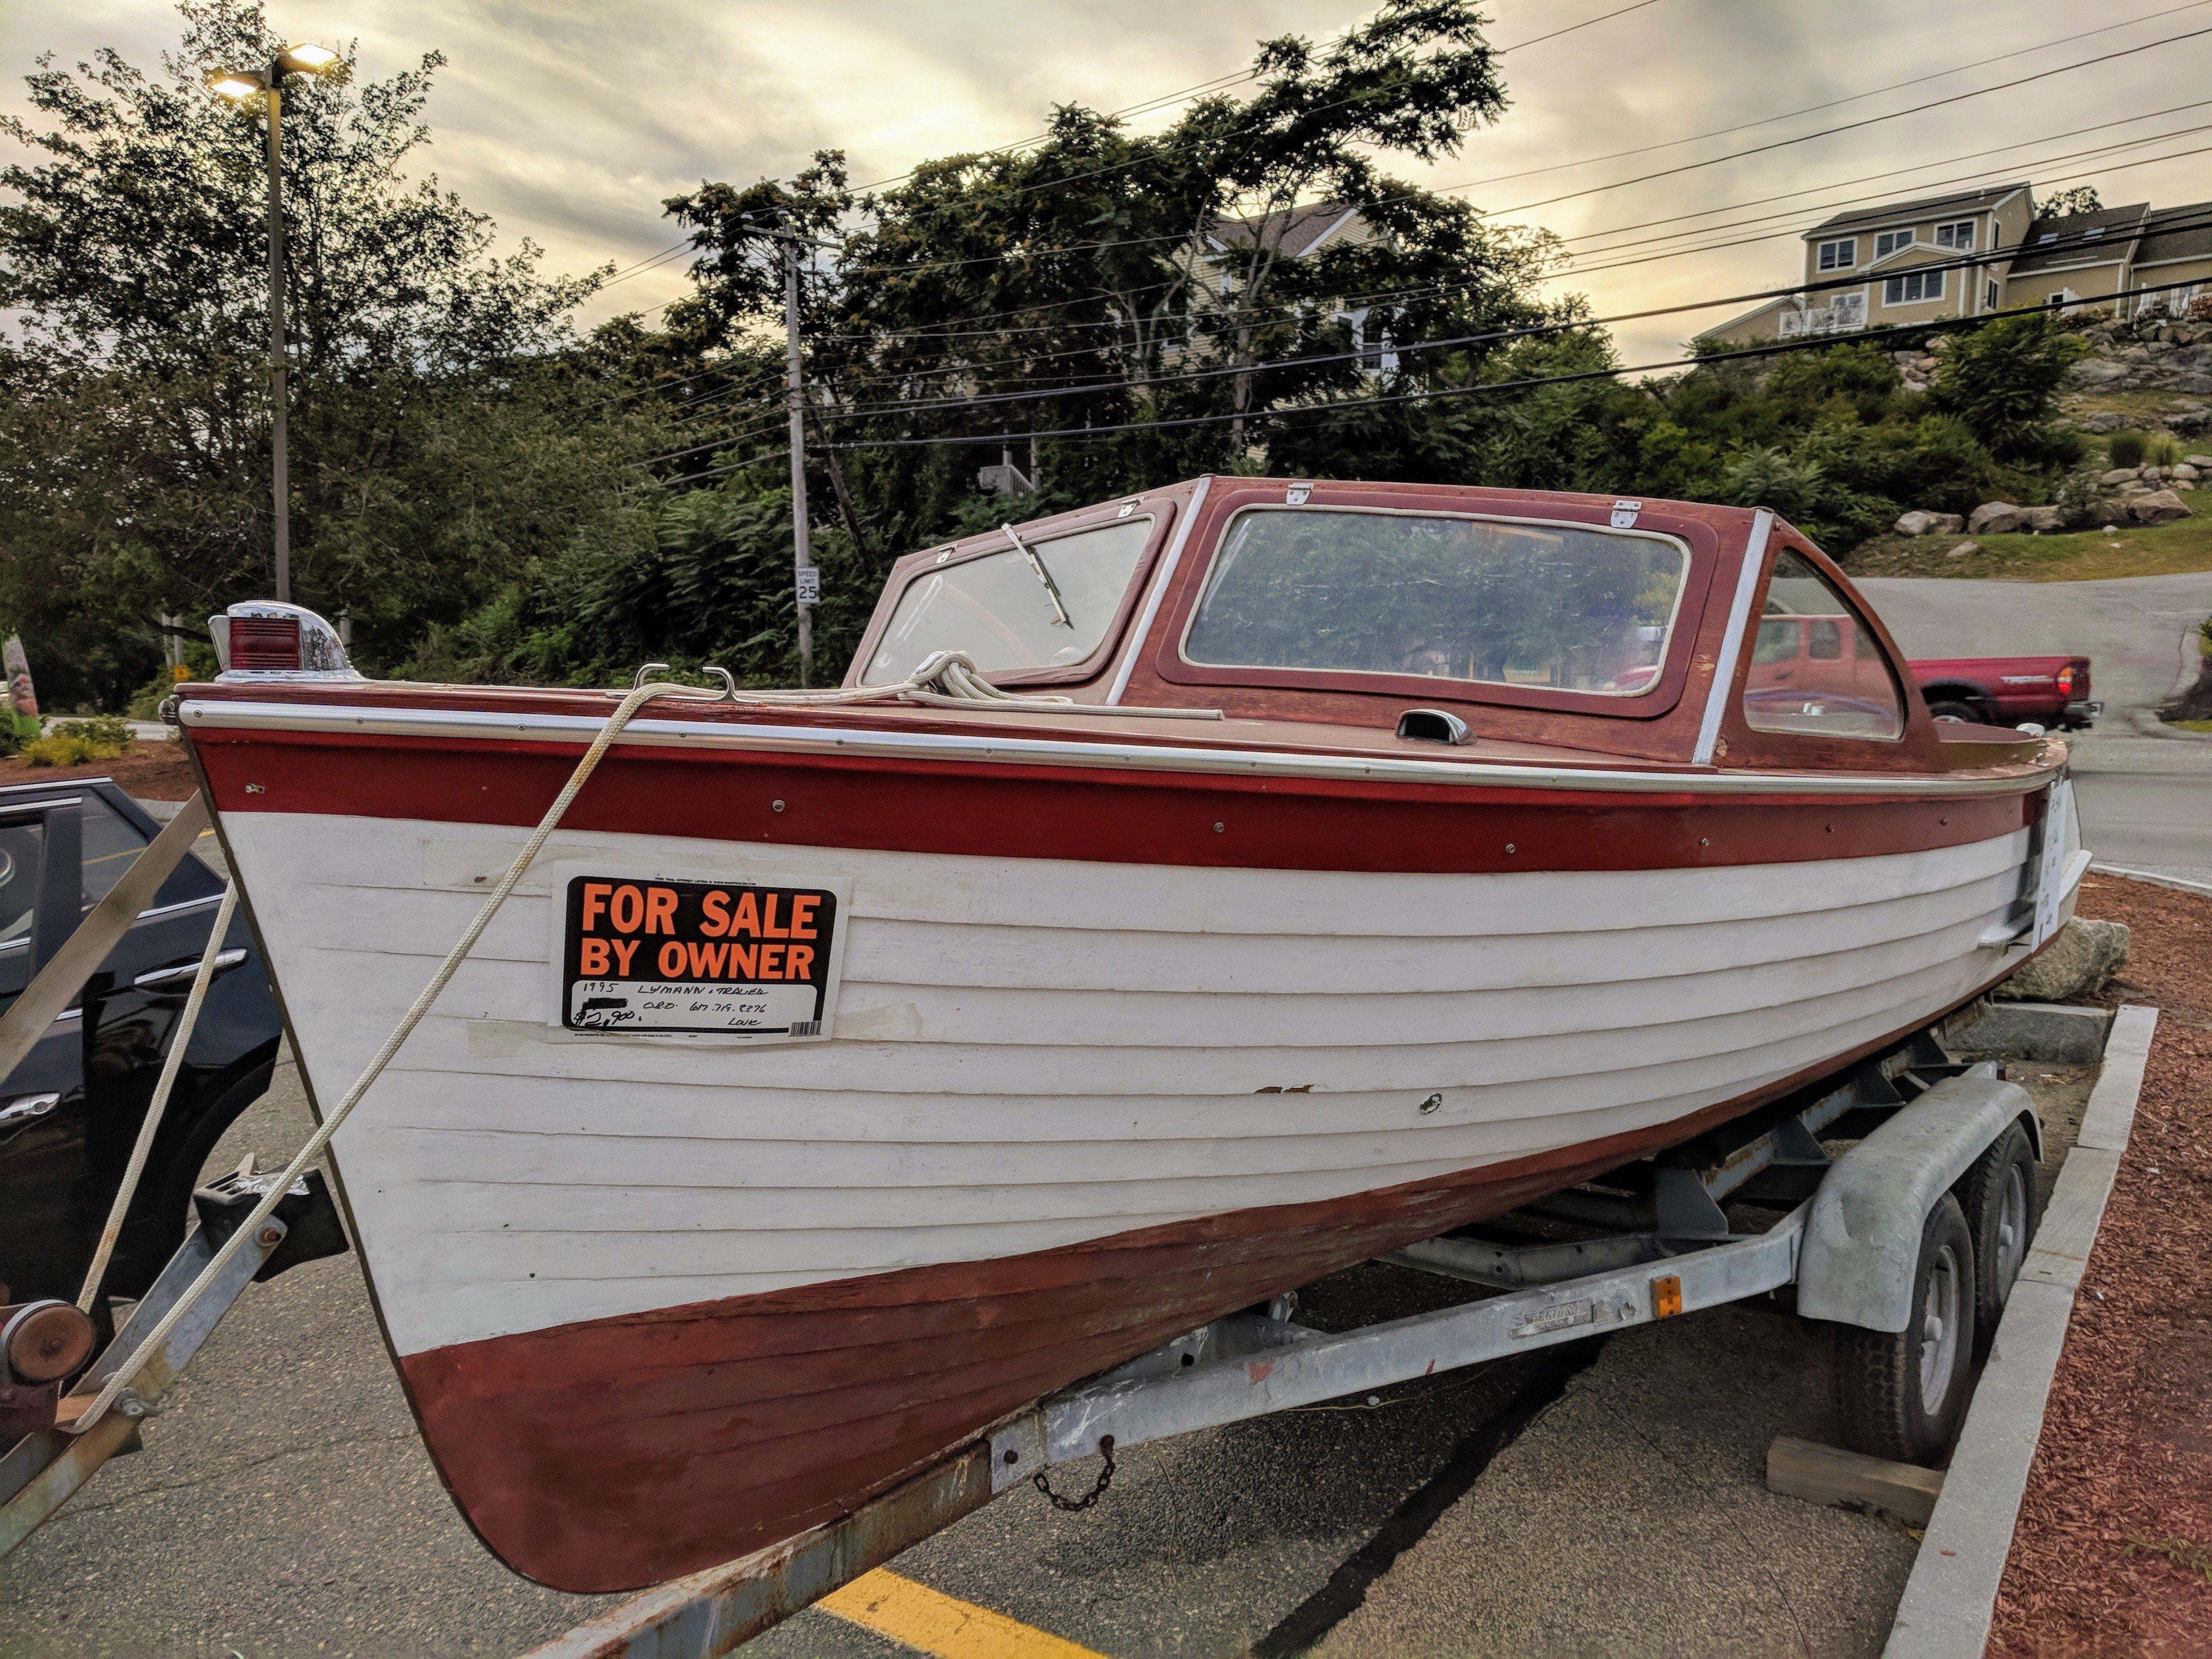 1959 Lyman boat for sale_20180917_Gloucester Mass ©Catherine Ryan (4).jpg